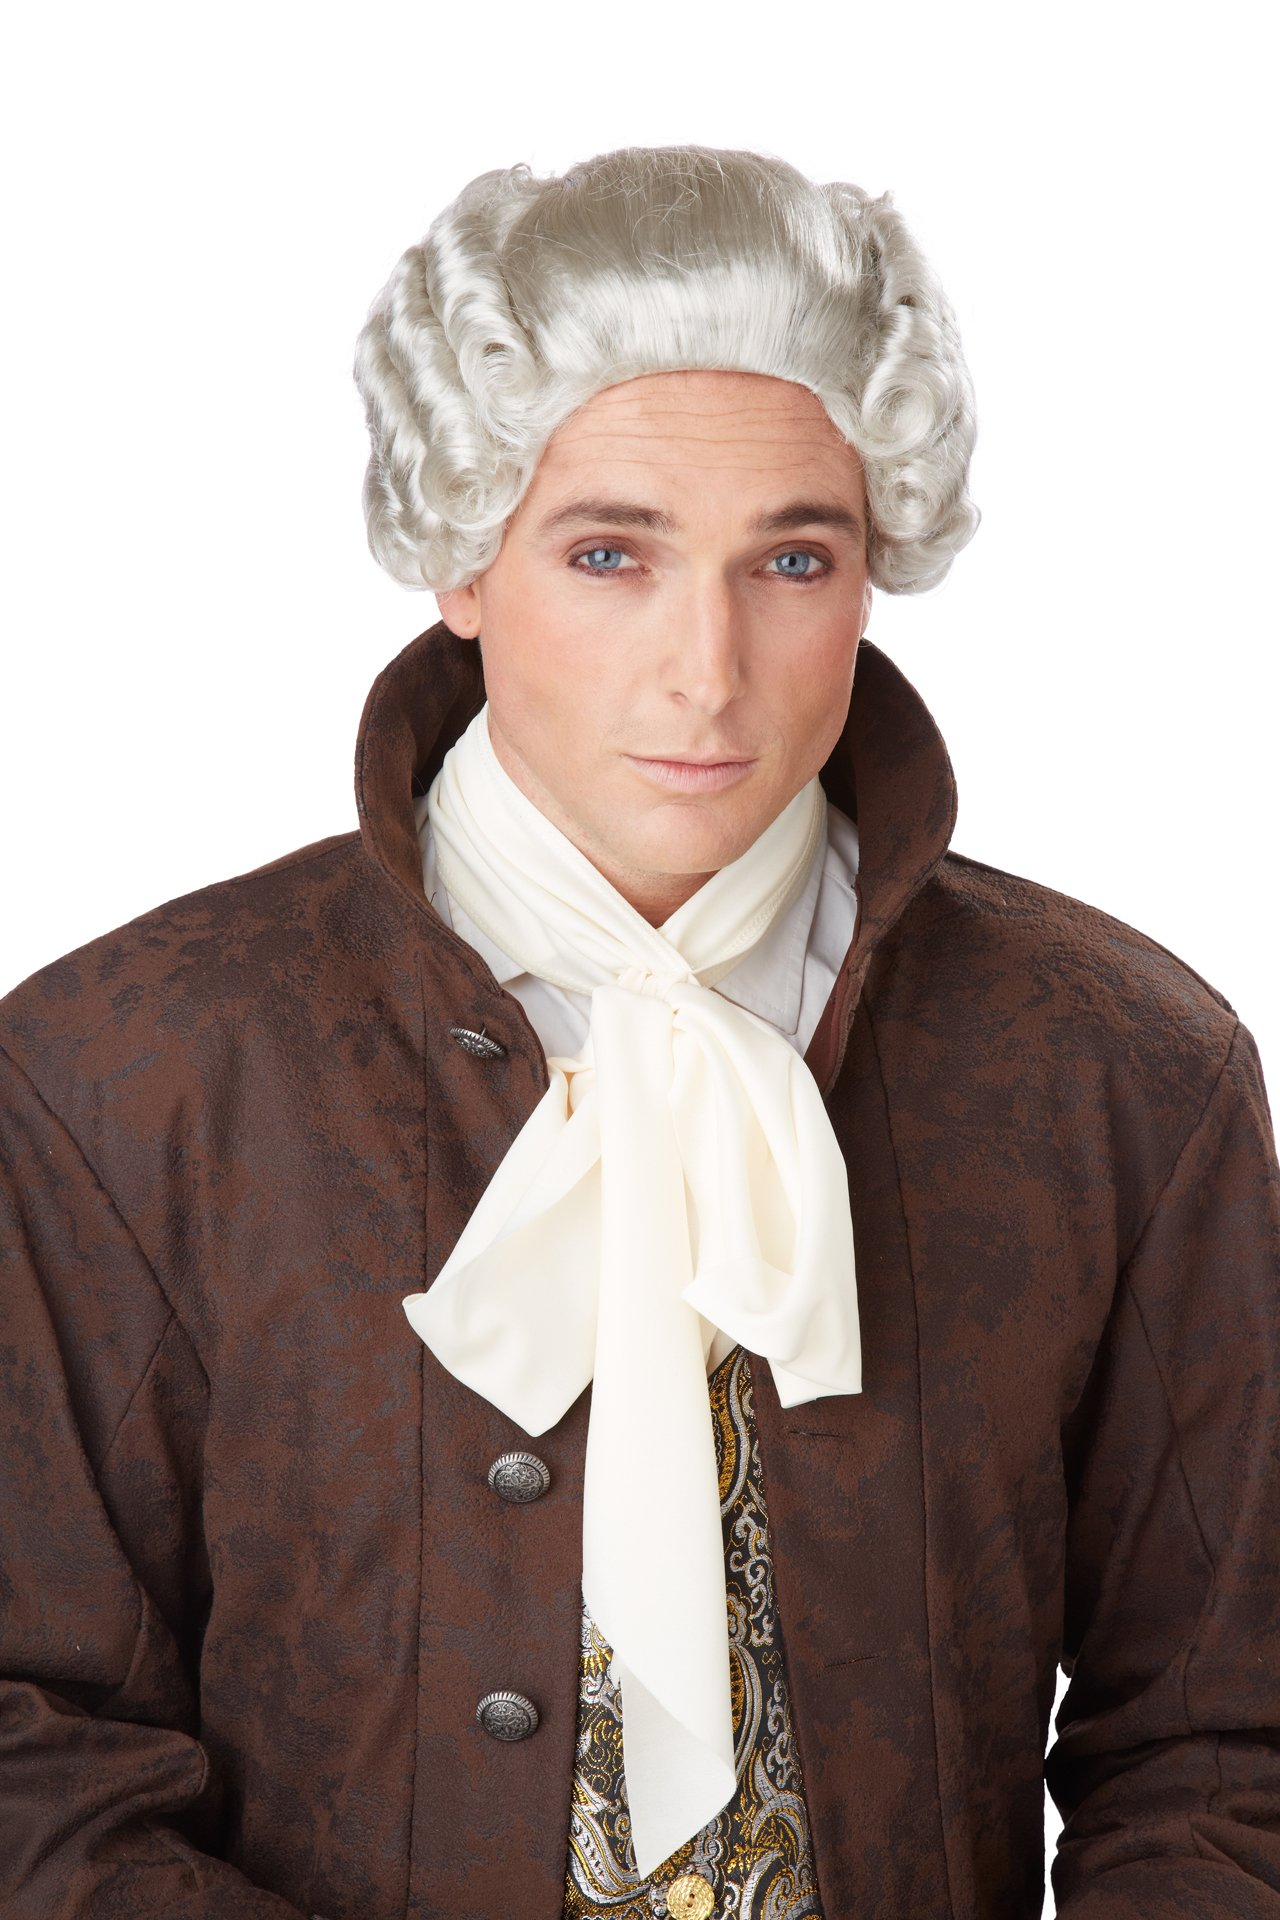 California Costumes Men's 18Th Century Peruke Wig, Grey, One Size